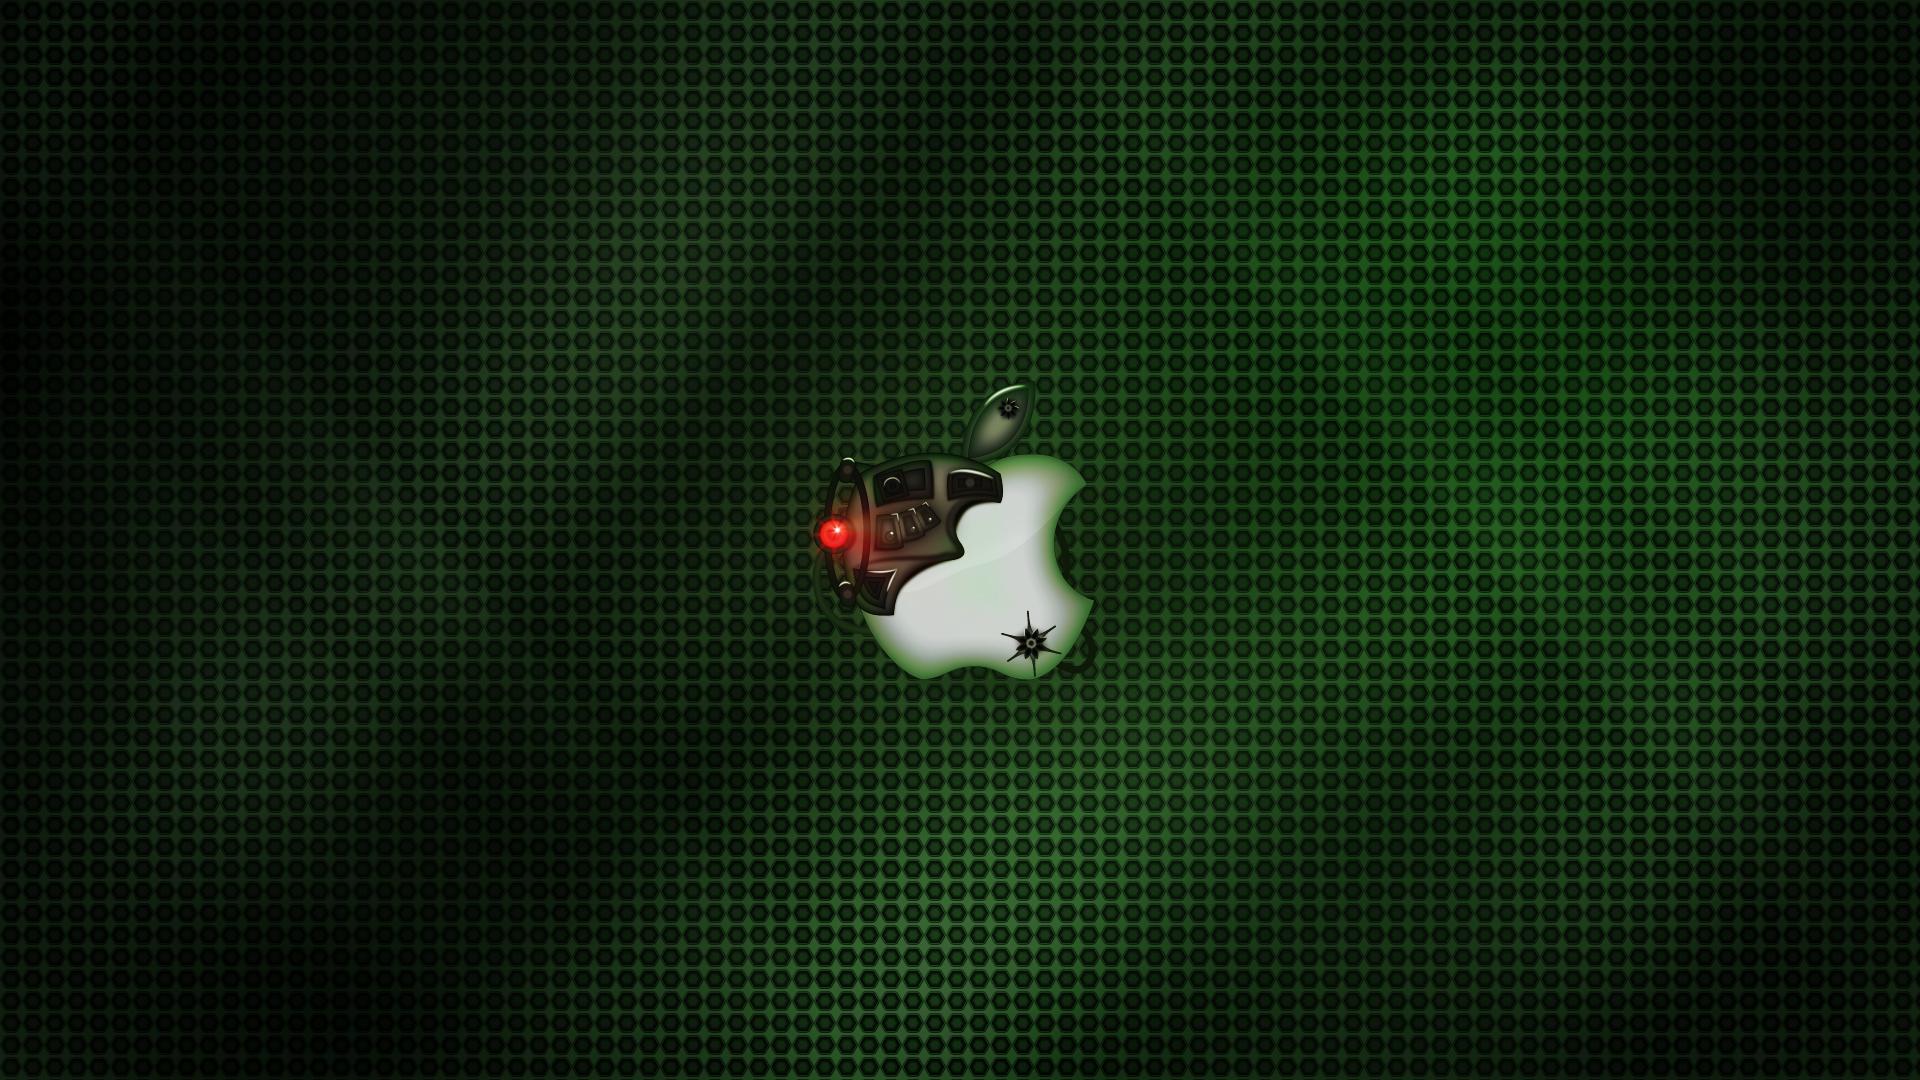 Borg Apple HD Wallpaper Background Image 1920x1080 ID255991 1920x1080